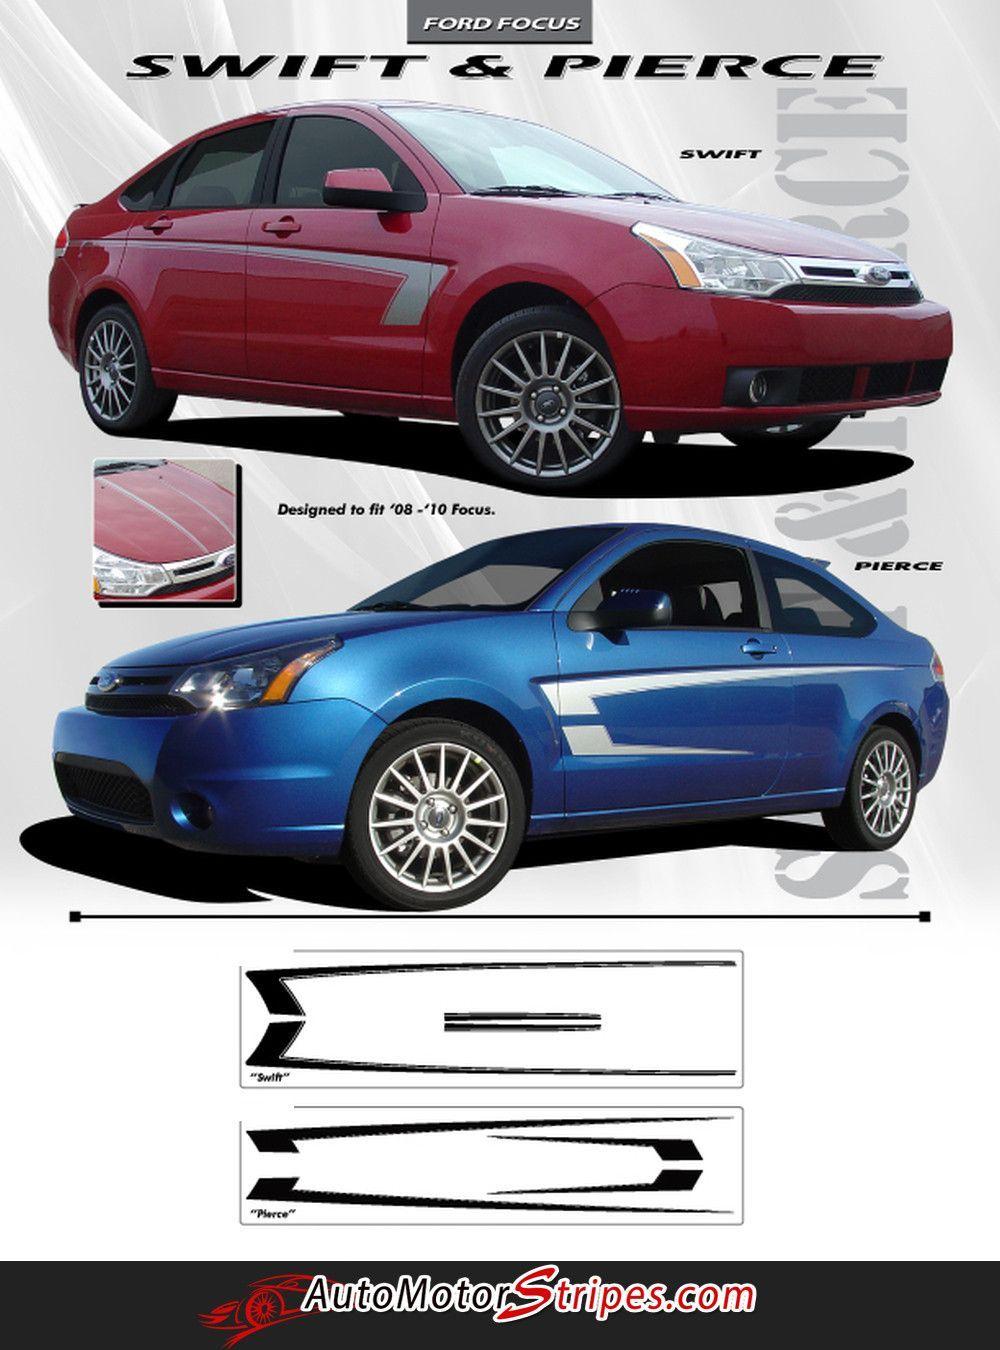 2008 2010 ford focus swift side door vinyl accent graphic 3m decals stripes